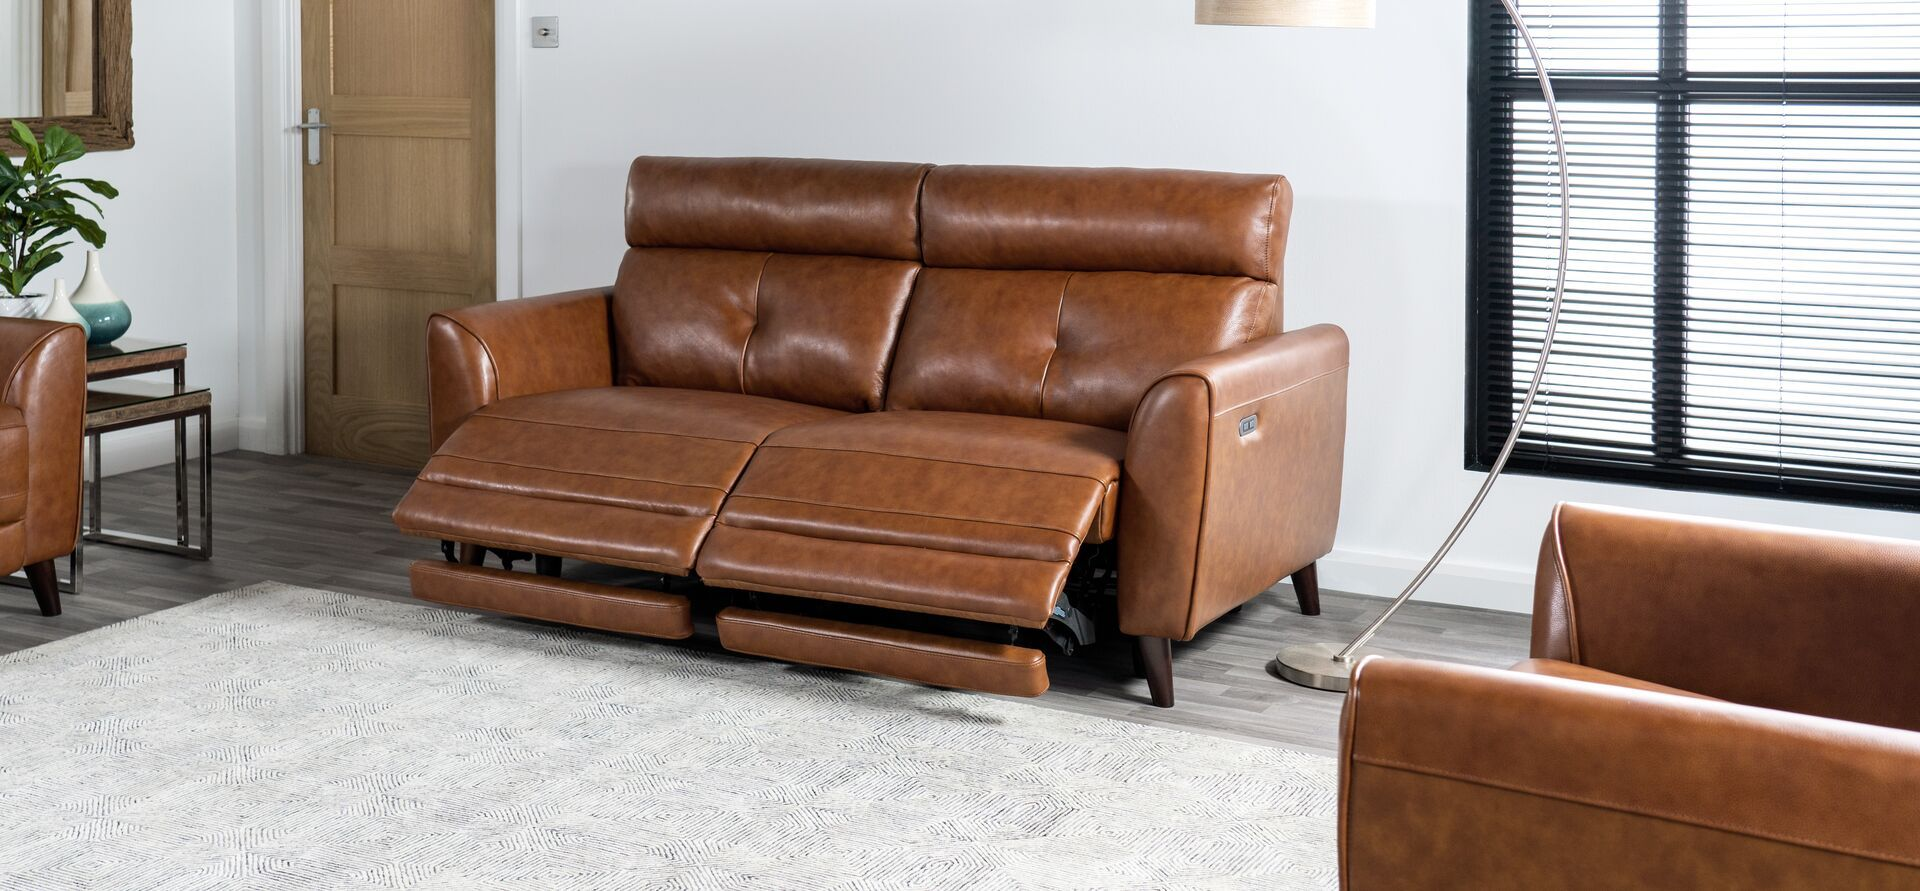 Sisi Italia Rossini 3 Seater Power Recliner Sofa Scs Power Reclining Sofa Power Recliners Reclining Sofa